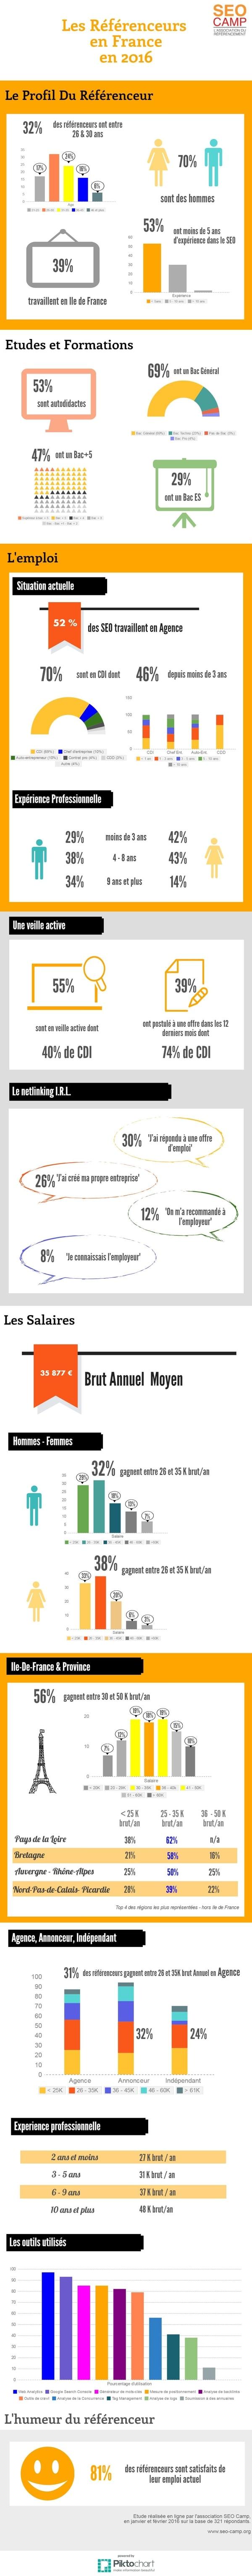 infographie-emploi-seocamp-2016